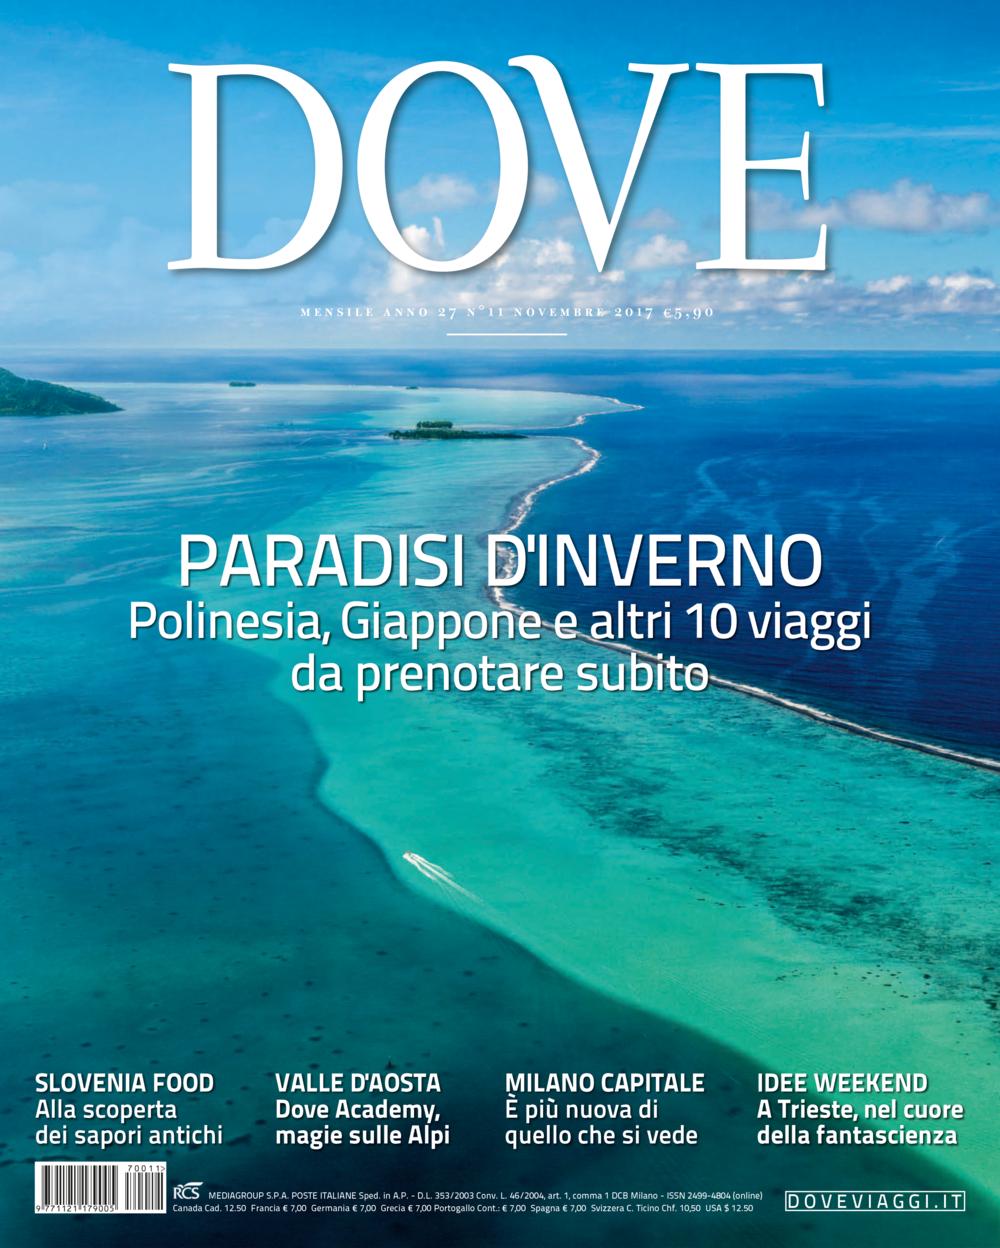 COVER OF THE NOVEMBER ISSUE OF THE MAGAZINE DOVE VIAGGI